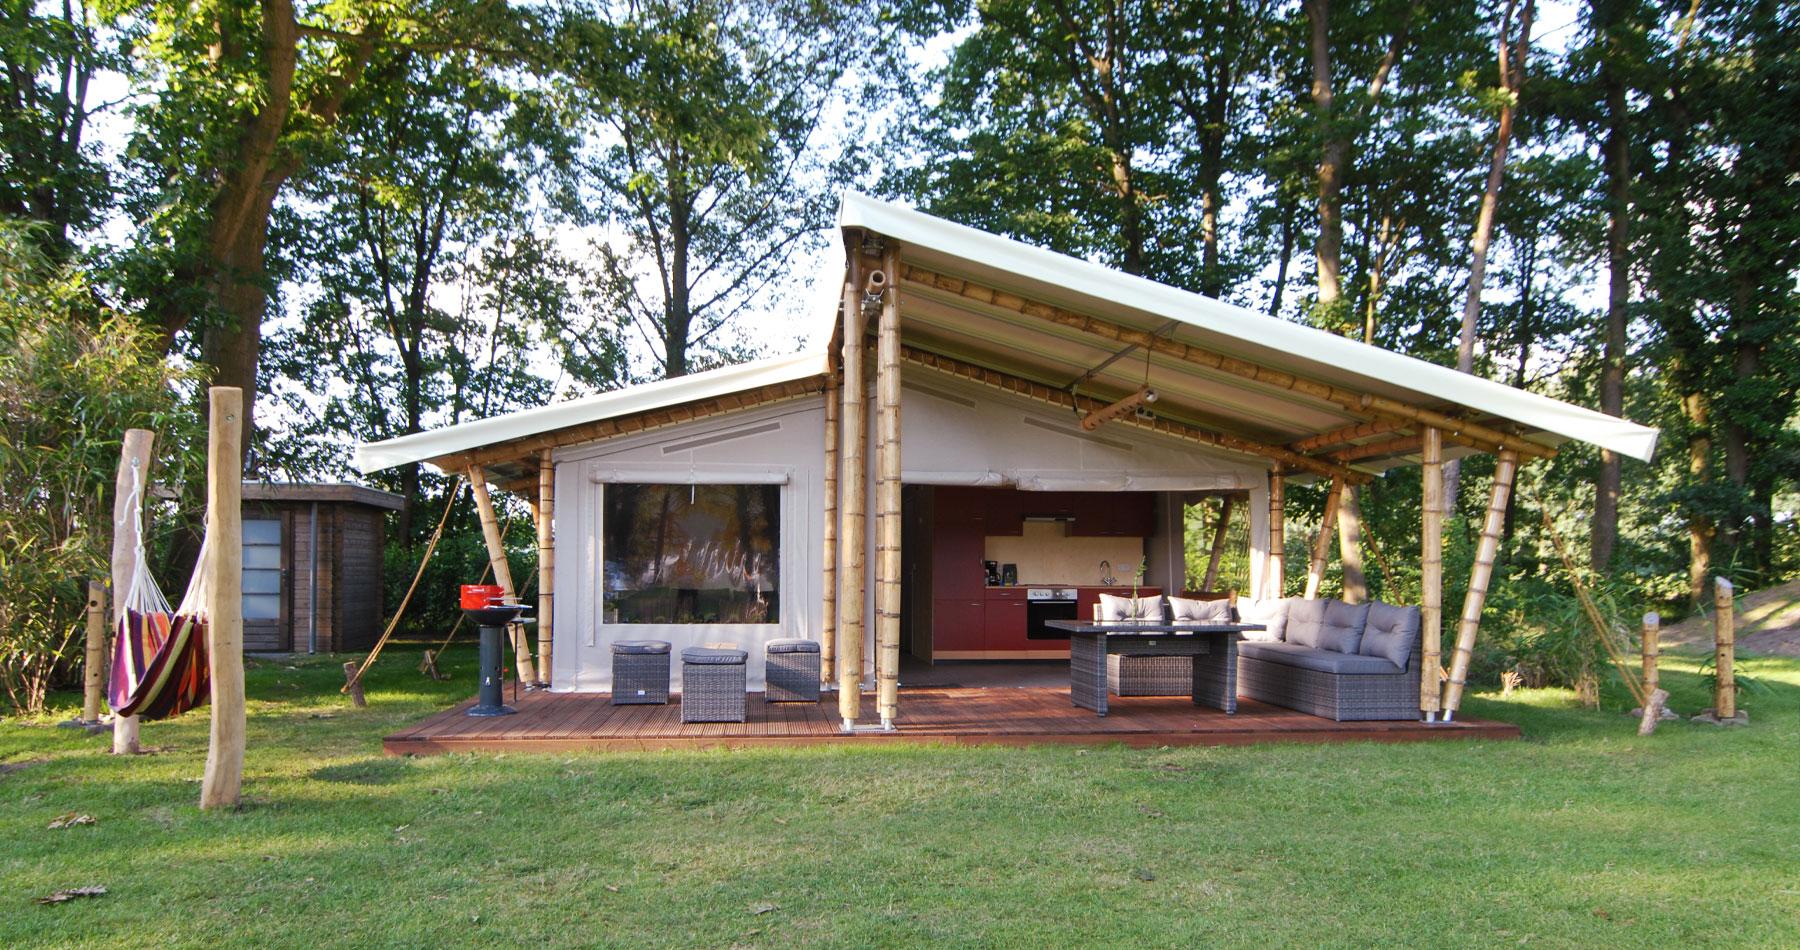 Customized-tent-lodge